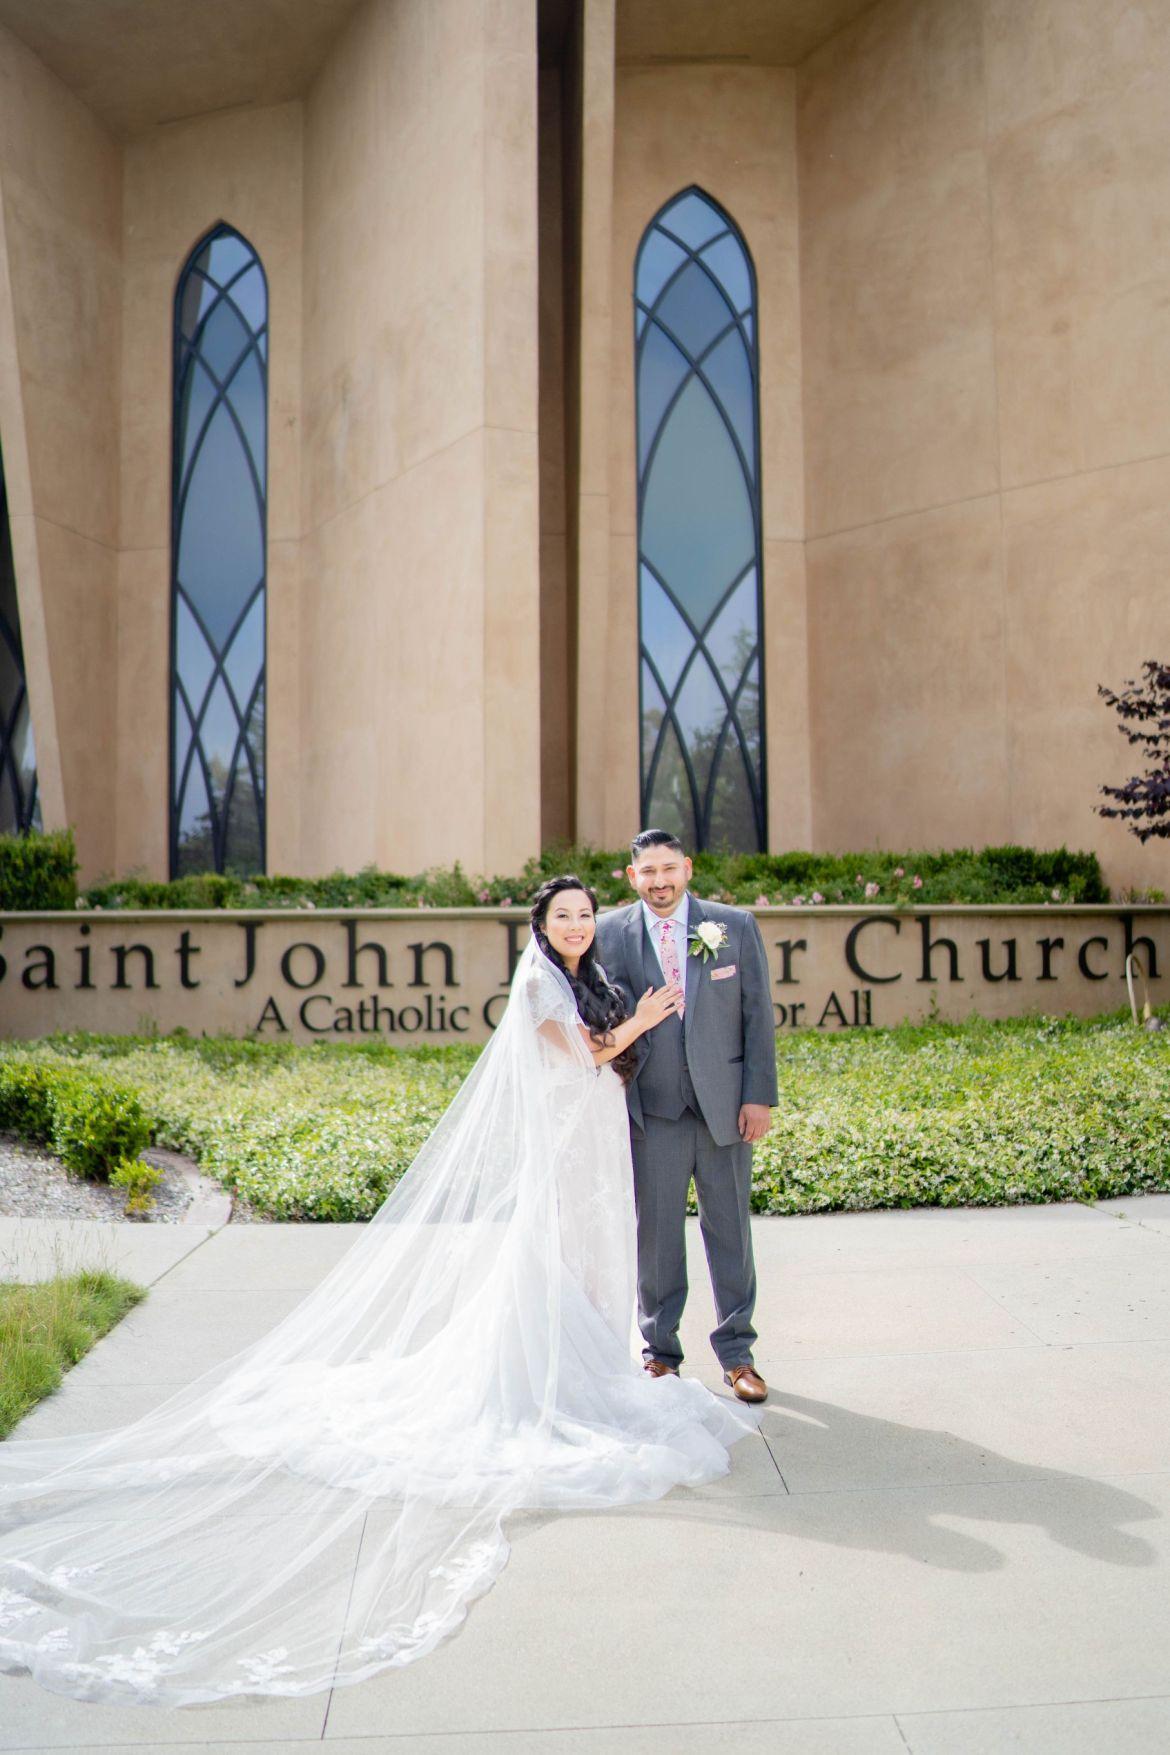 st john fisher church